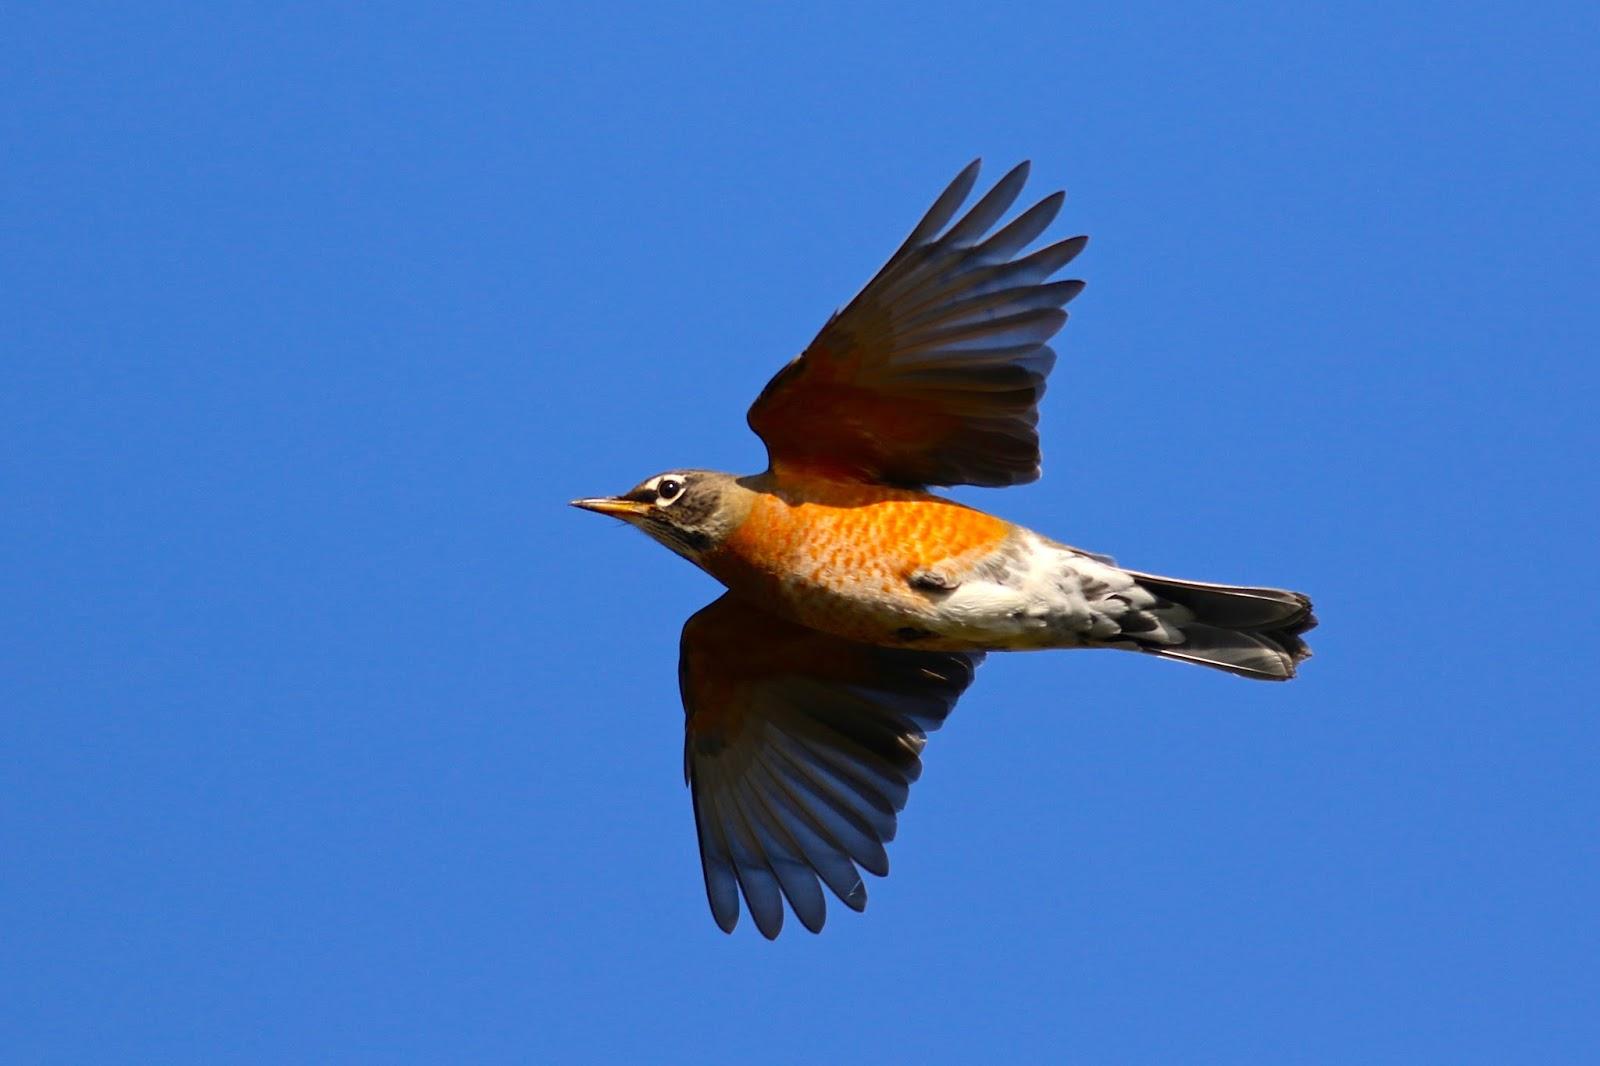 american robin bird flying - photo #10